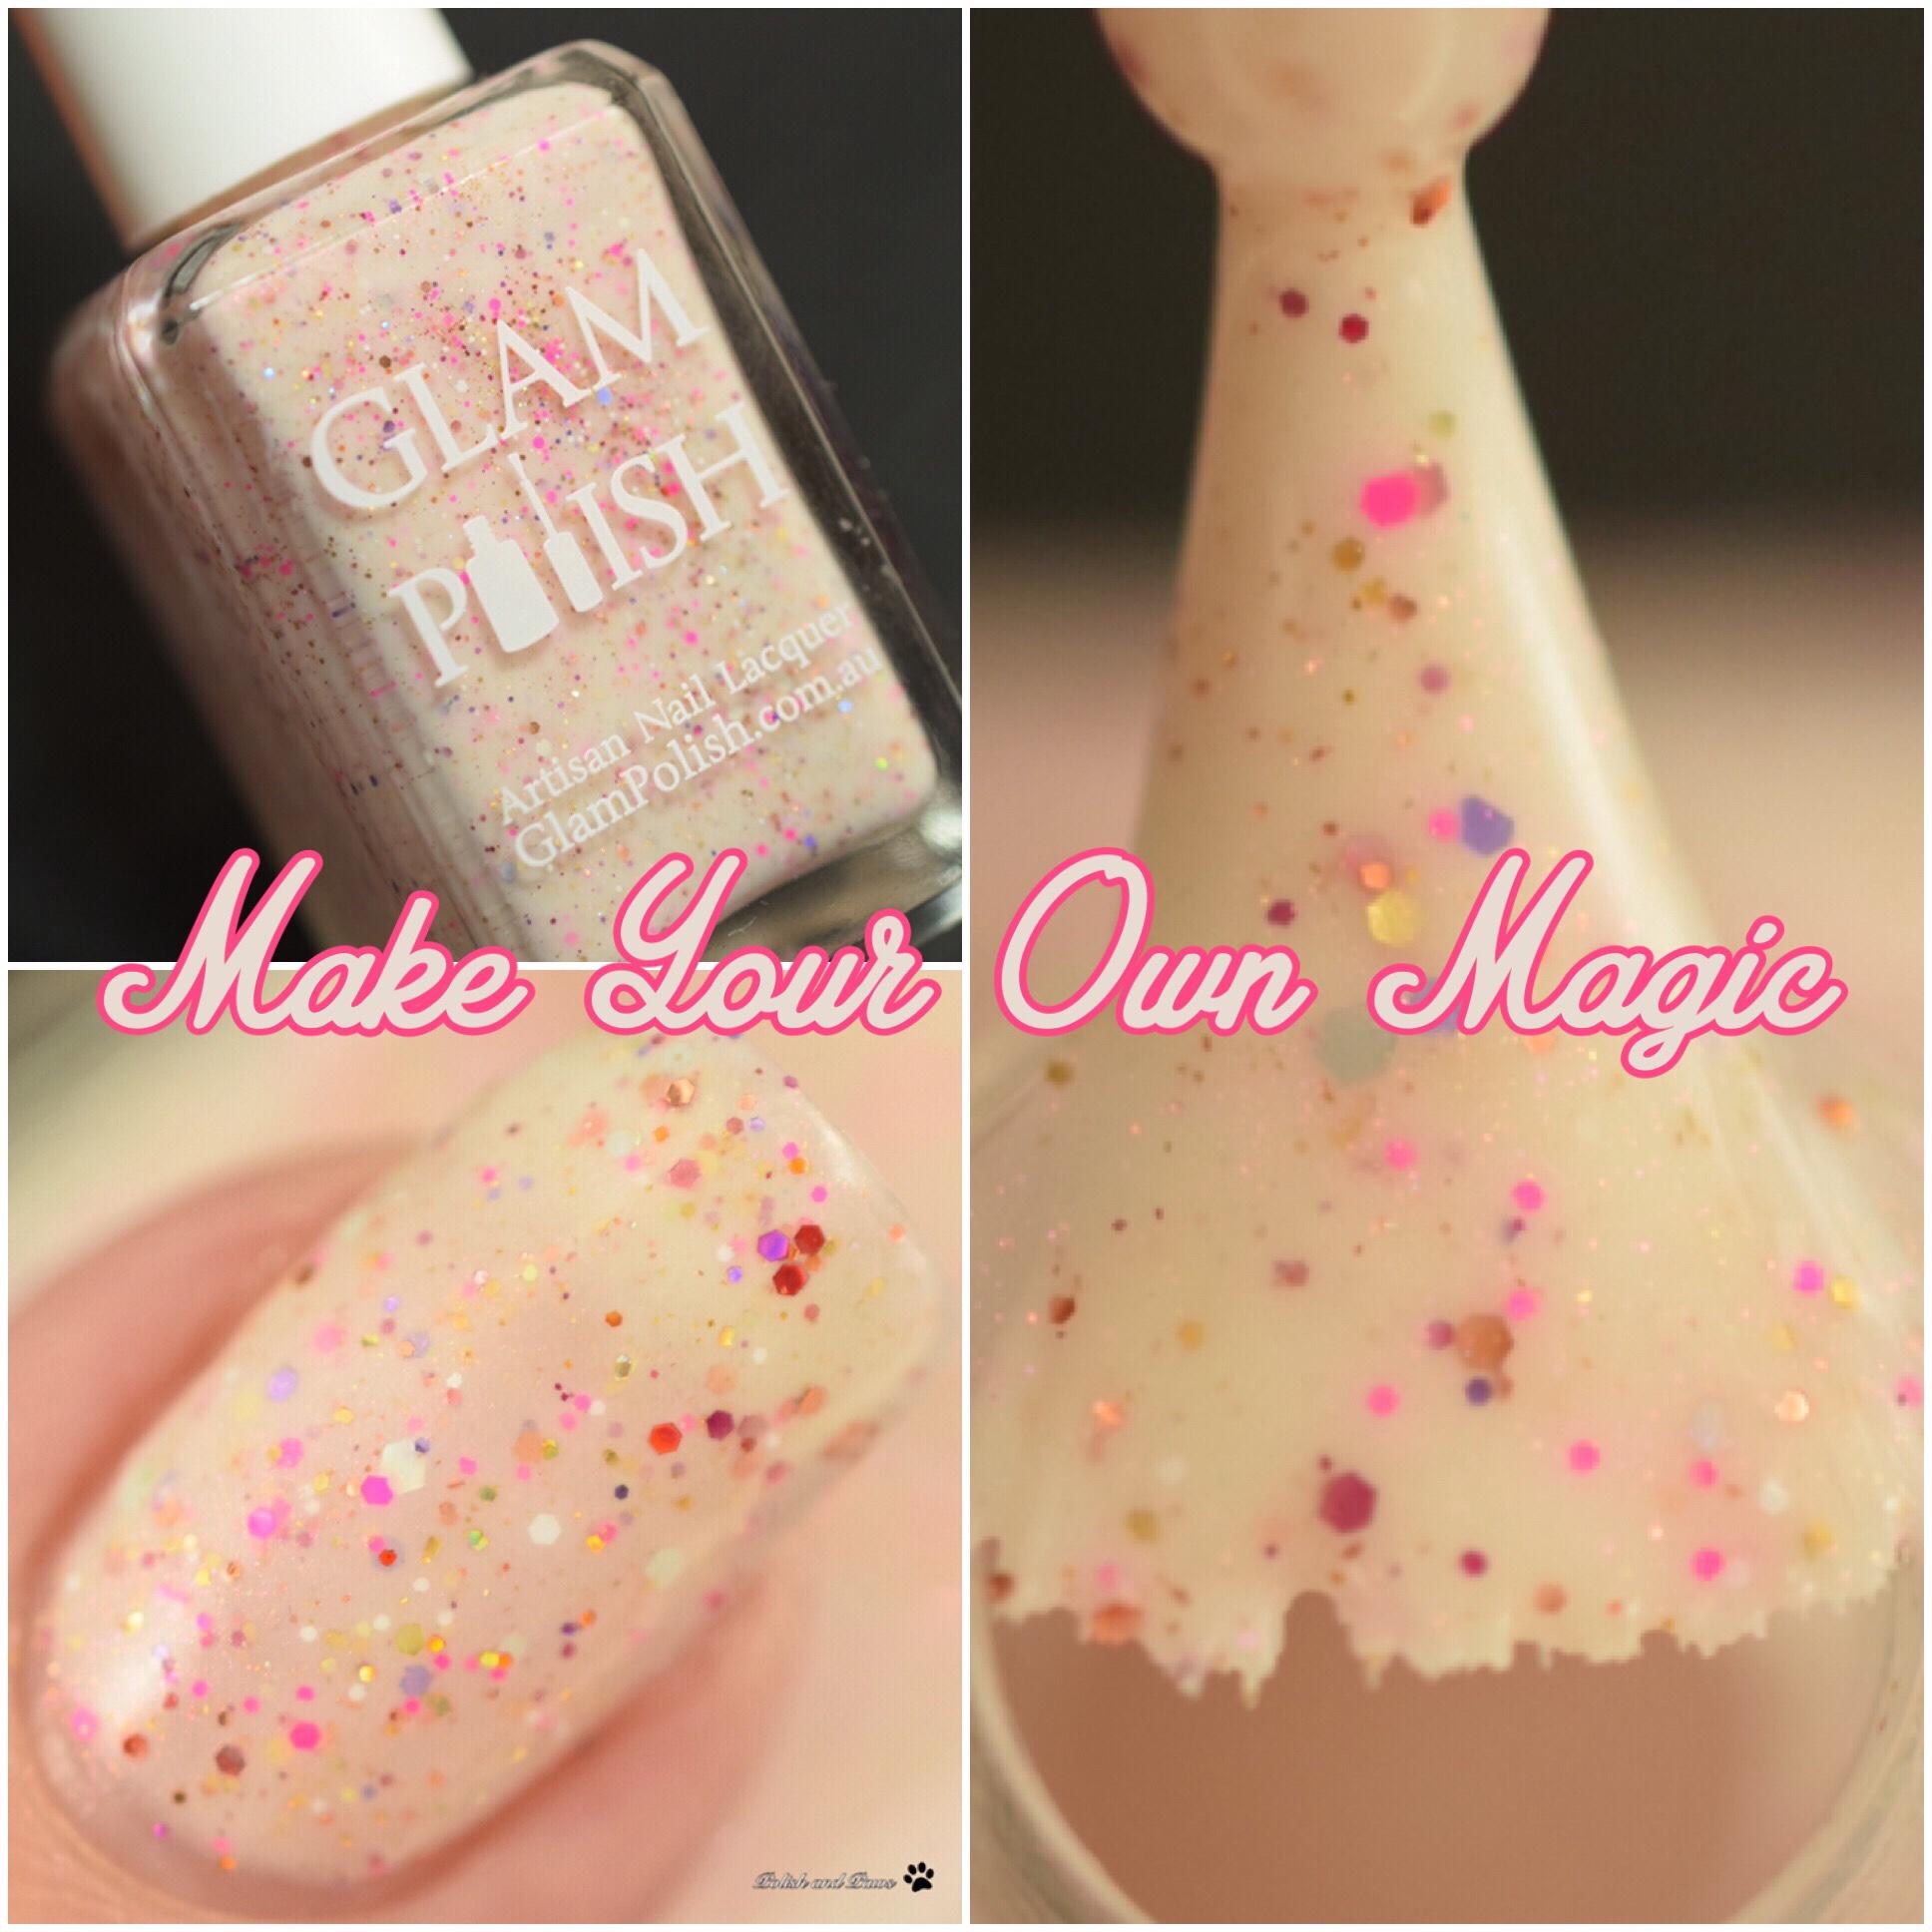 Glam Polish Make your own Magic